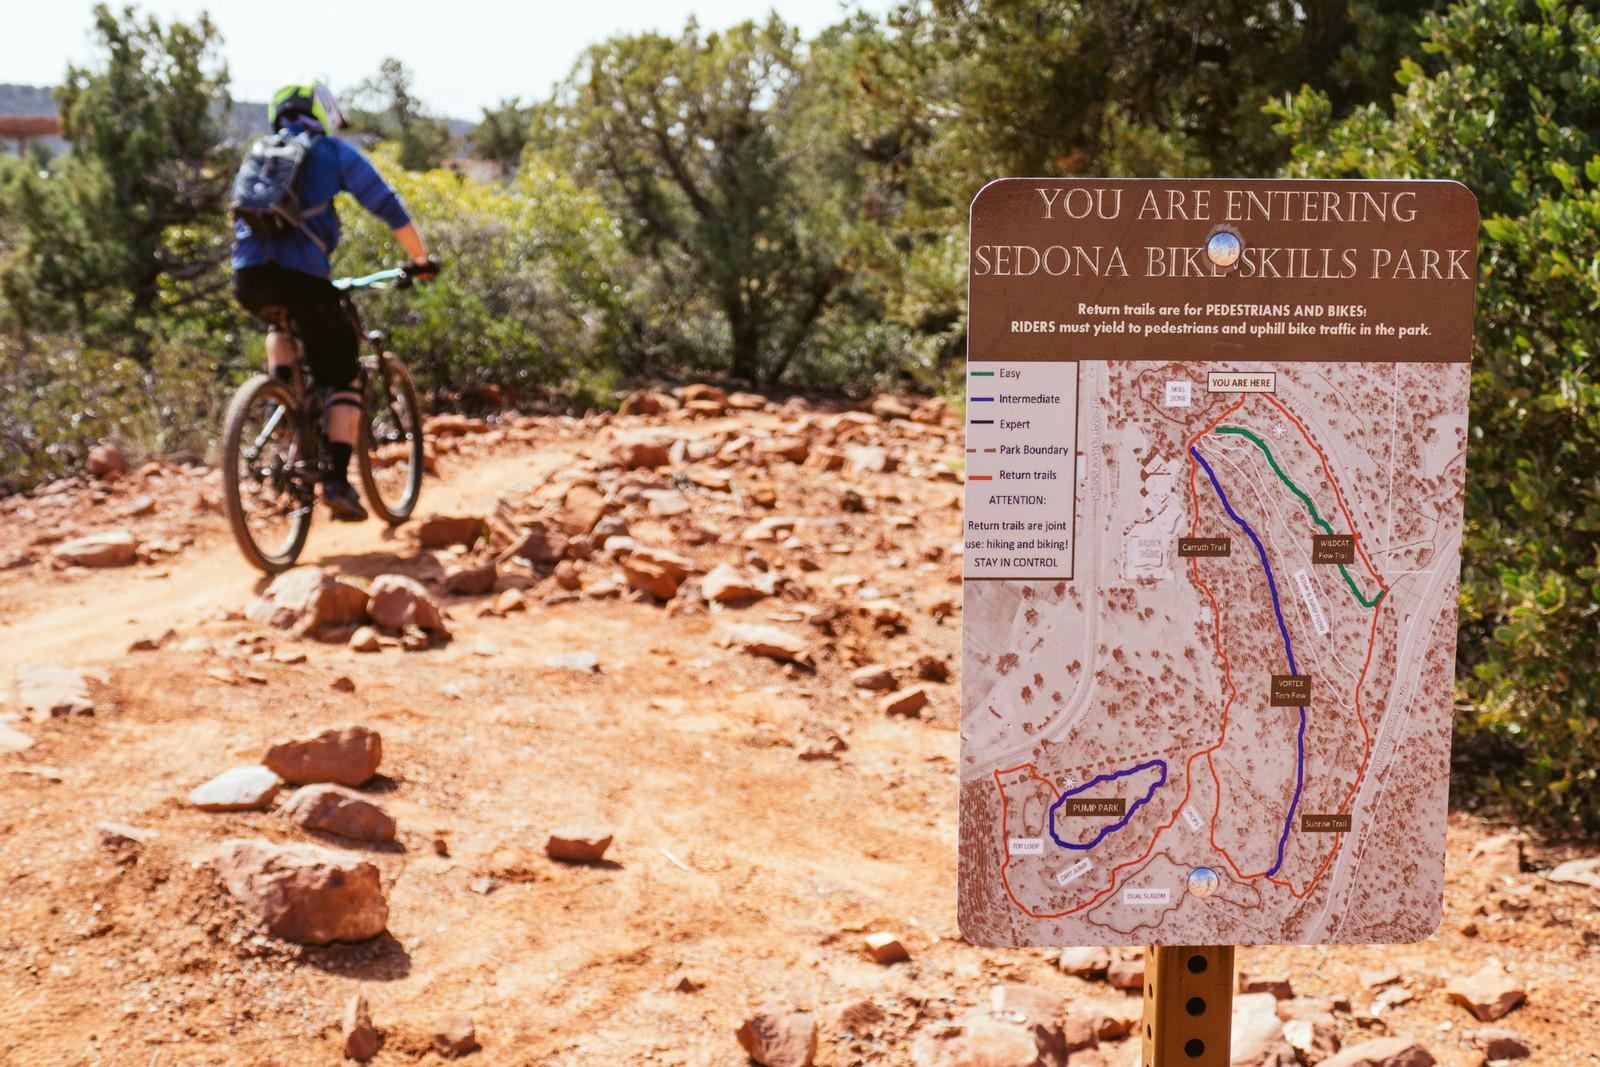 Sedona Bike Skills Park NOW OPEN! - PIT BITS - Fresh Products from the Sedona Mountain Bike Festival - Mountain Biking Pictures - Vital MTB